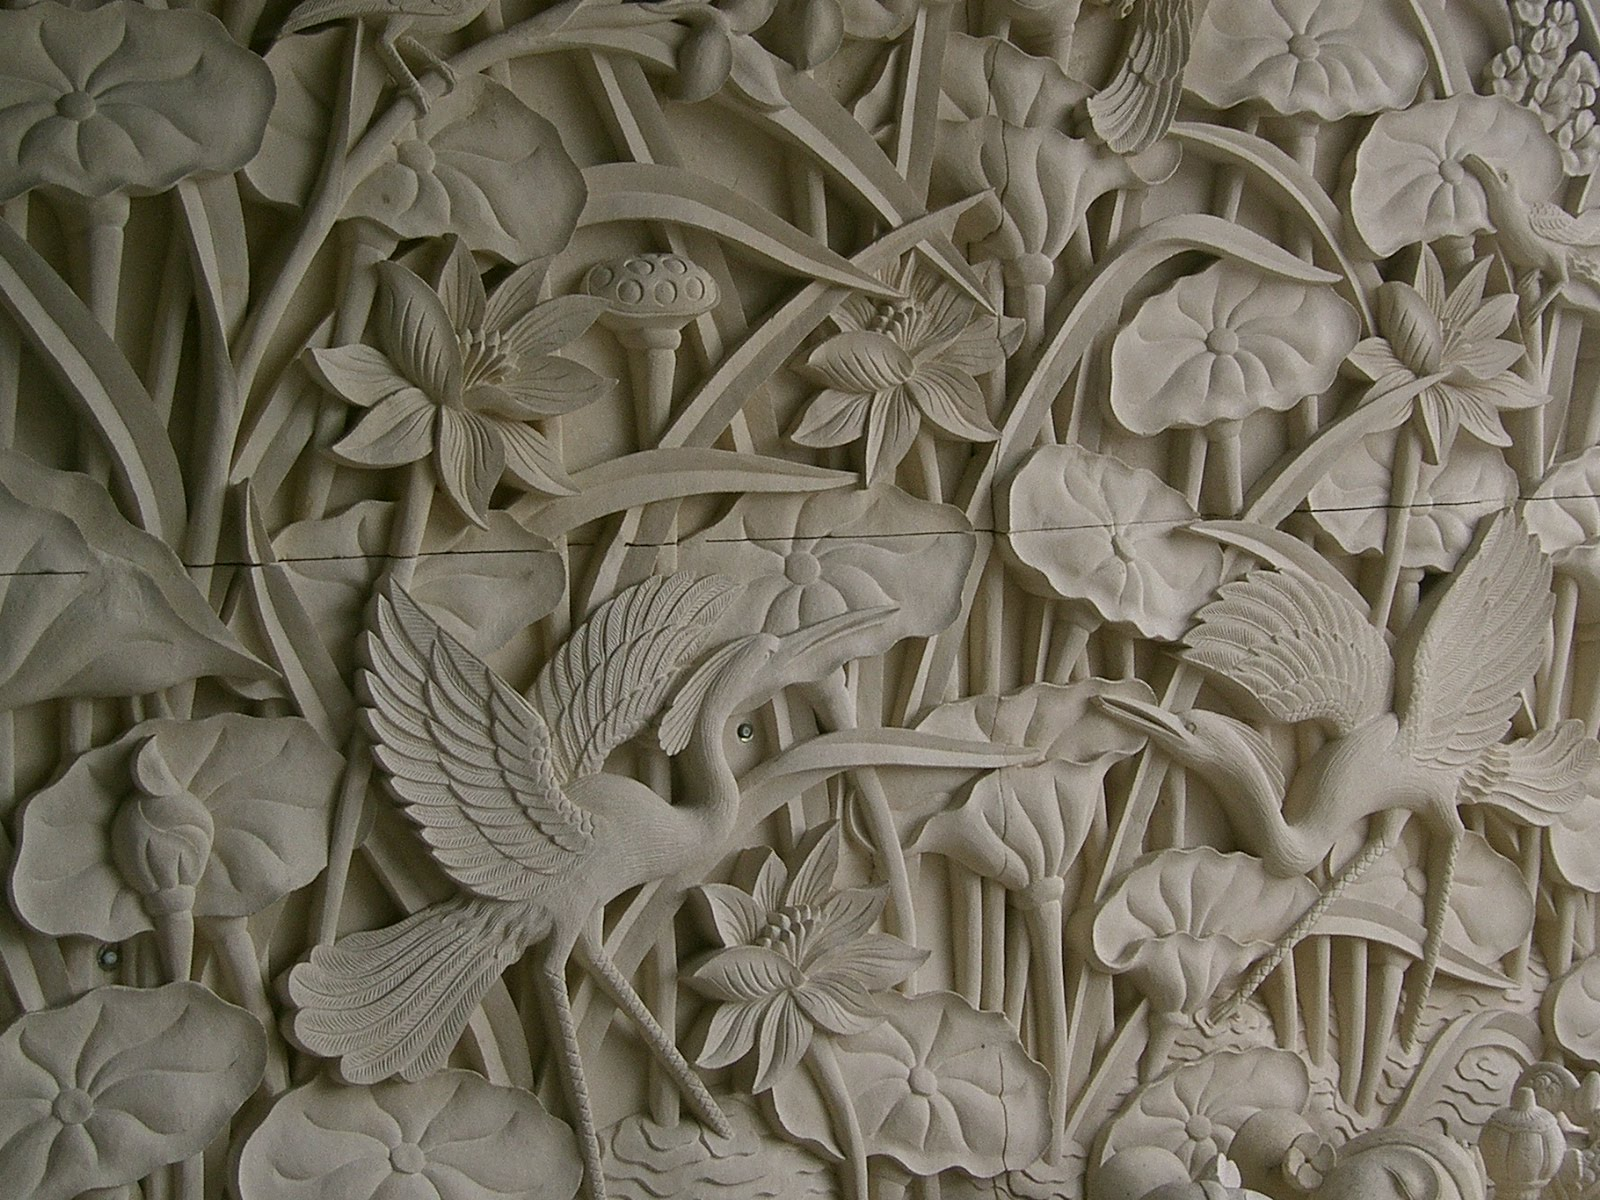 handicraft of wood | Kerajinan Bali : dewataukir.com empat belas